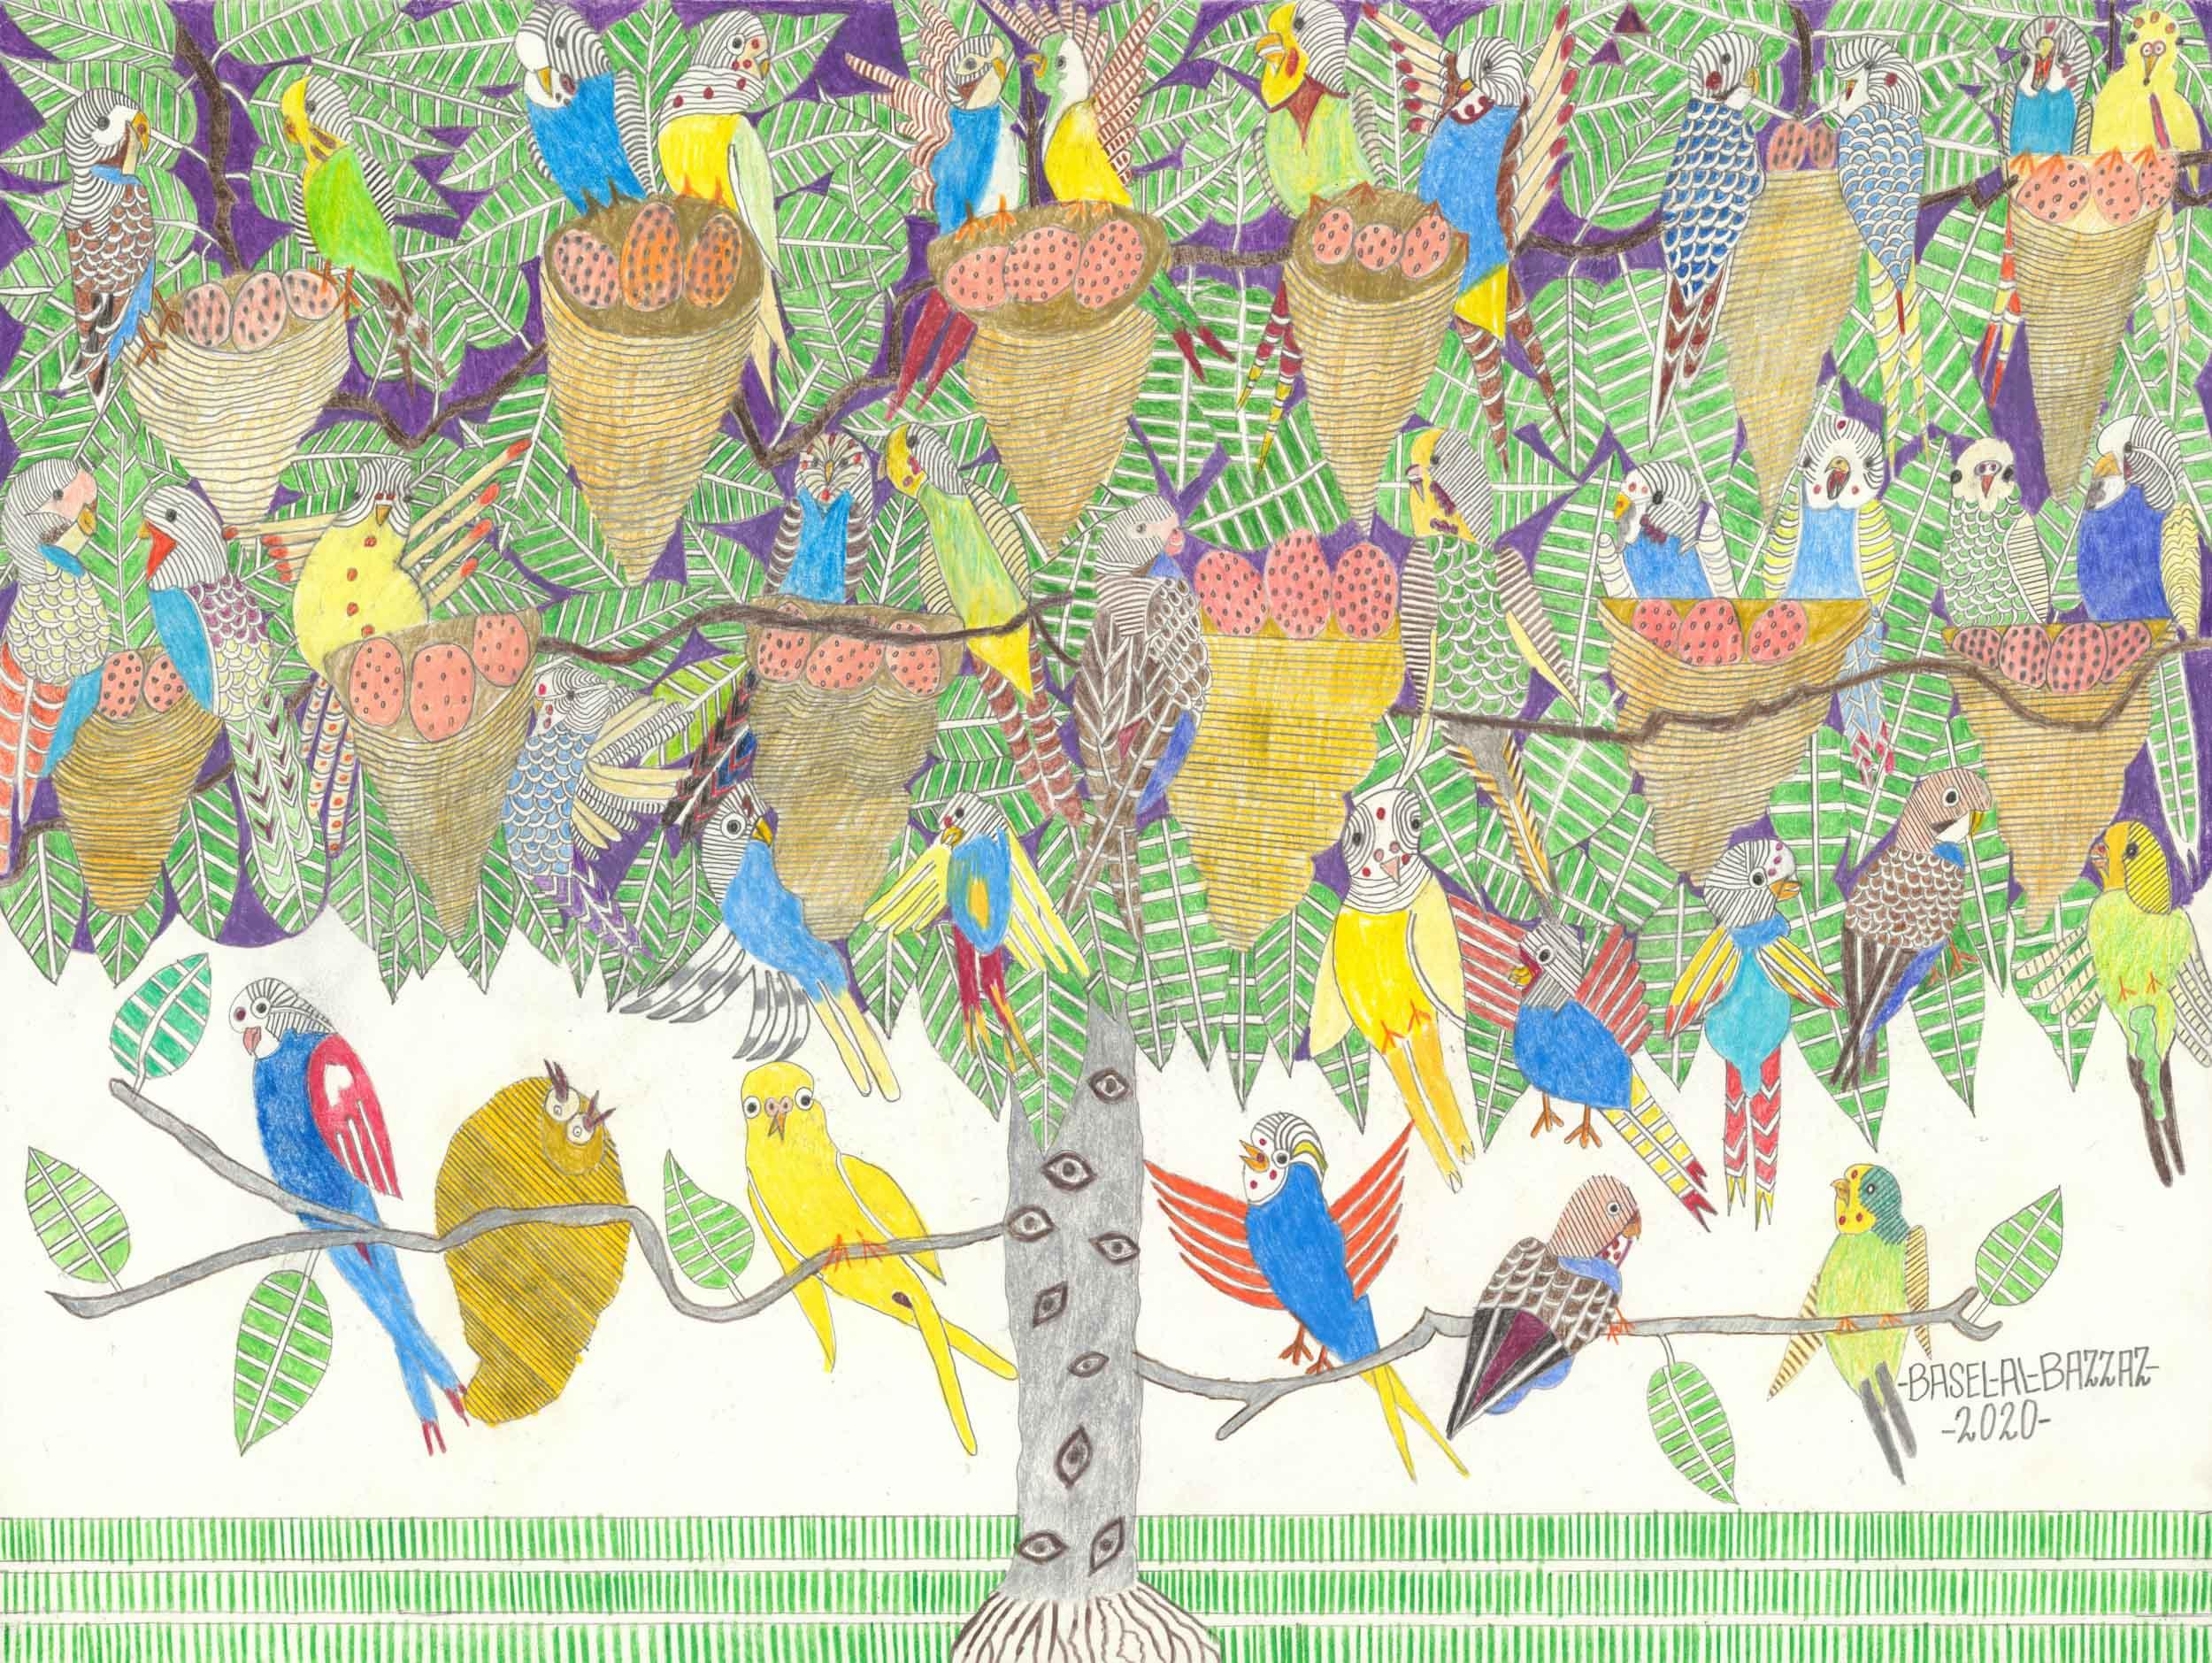 al-bazzaz basel - Sittiche im baum/parakeets in the tree